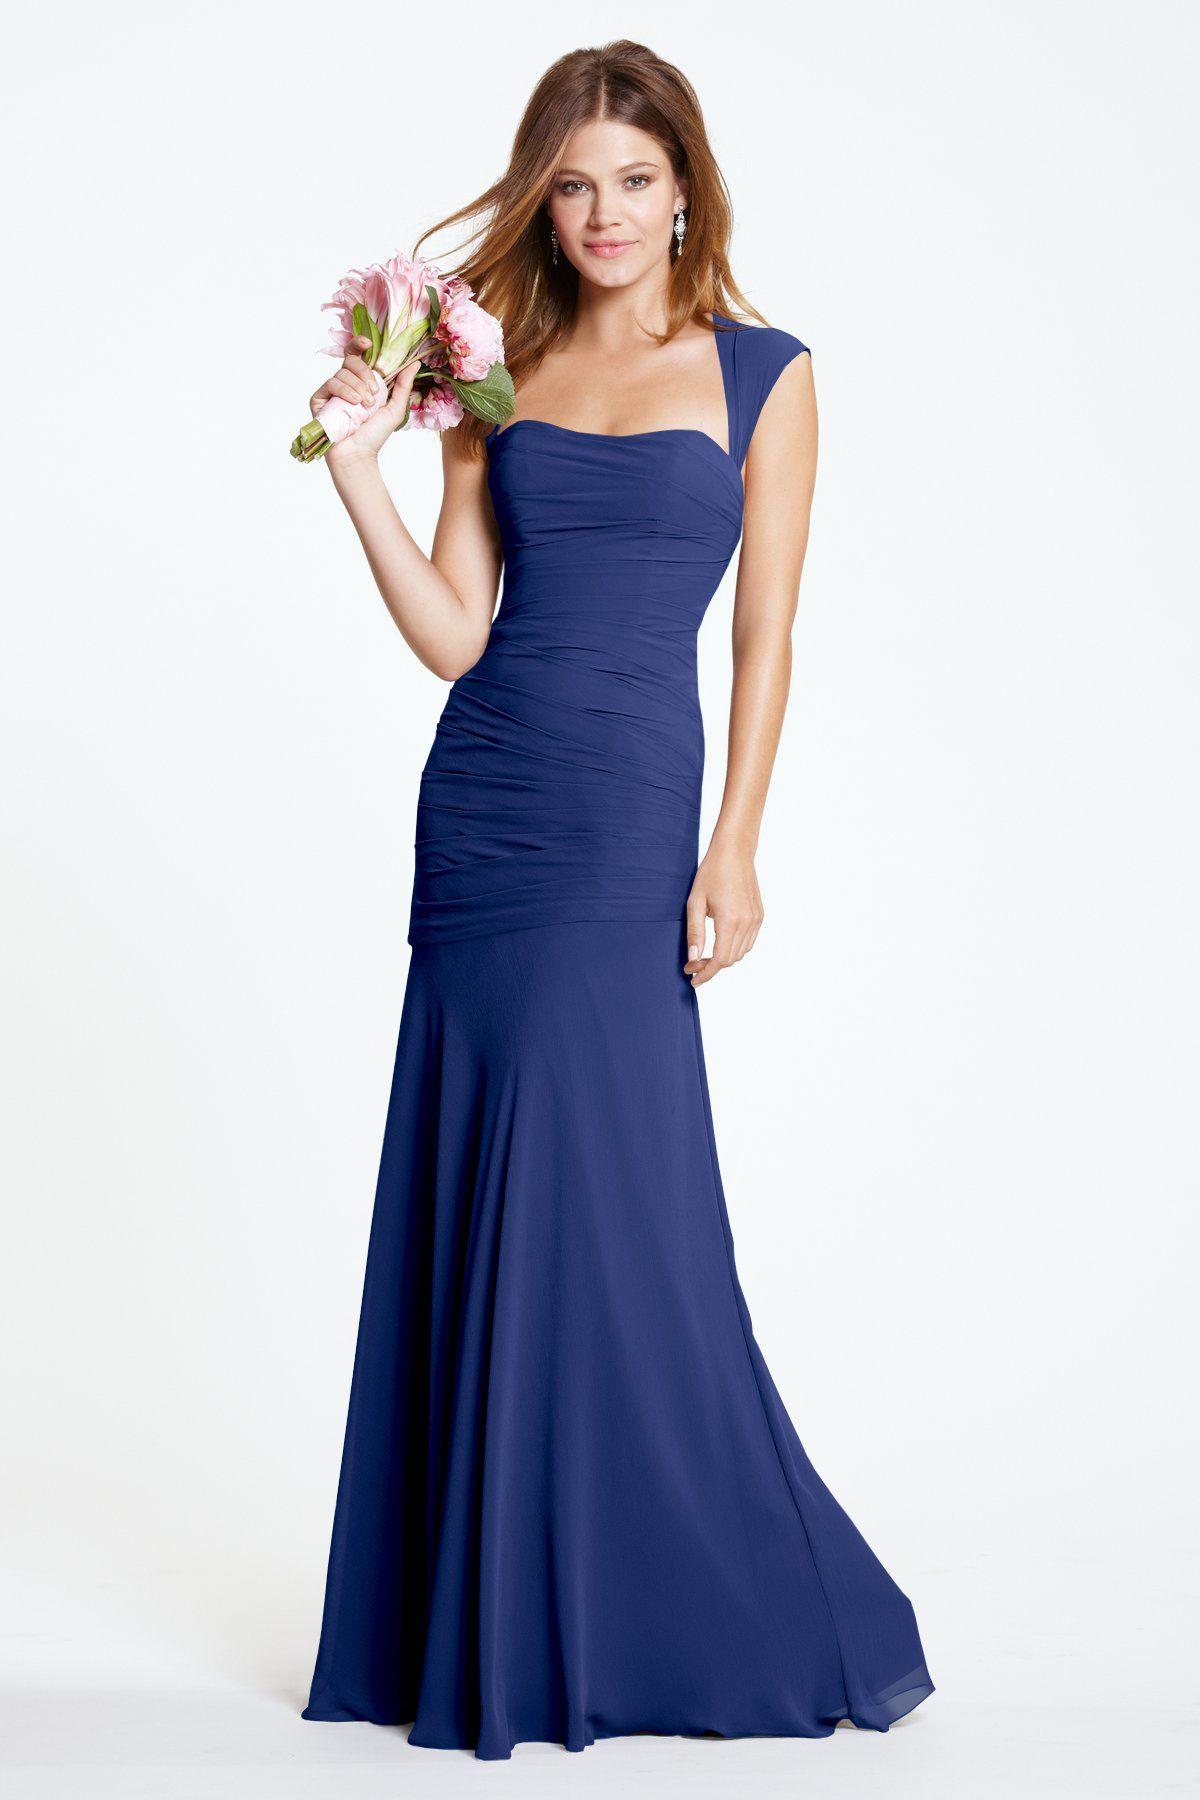 Watters iman bridesmaid dress weddington way peacock wedding